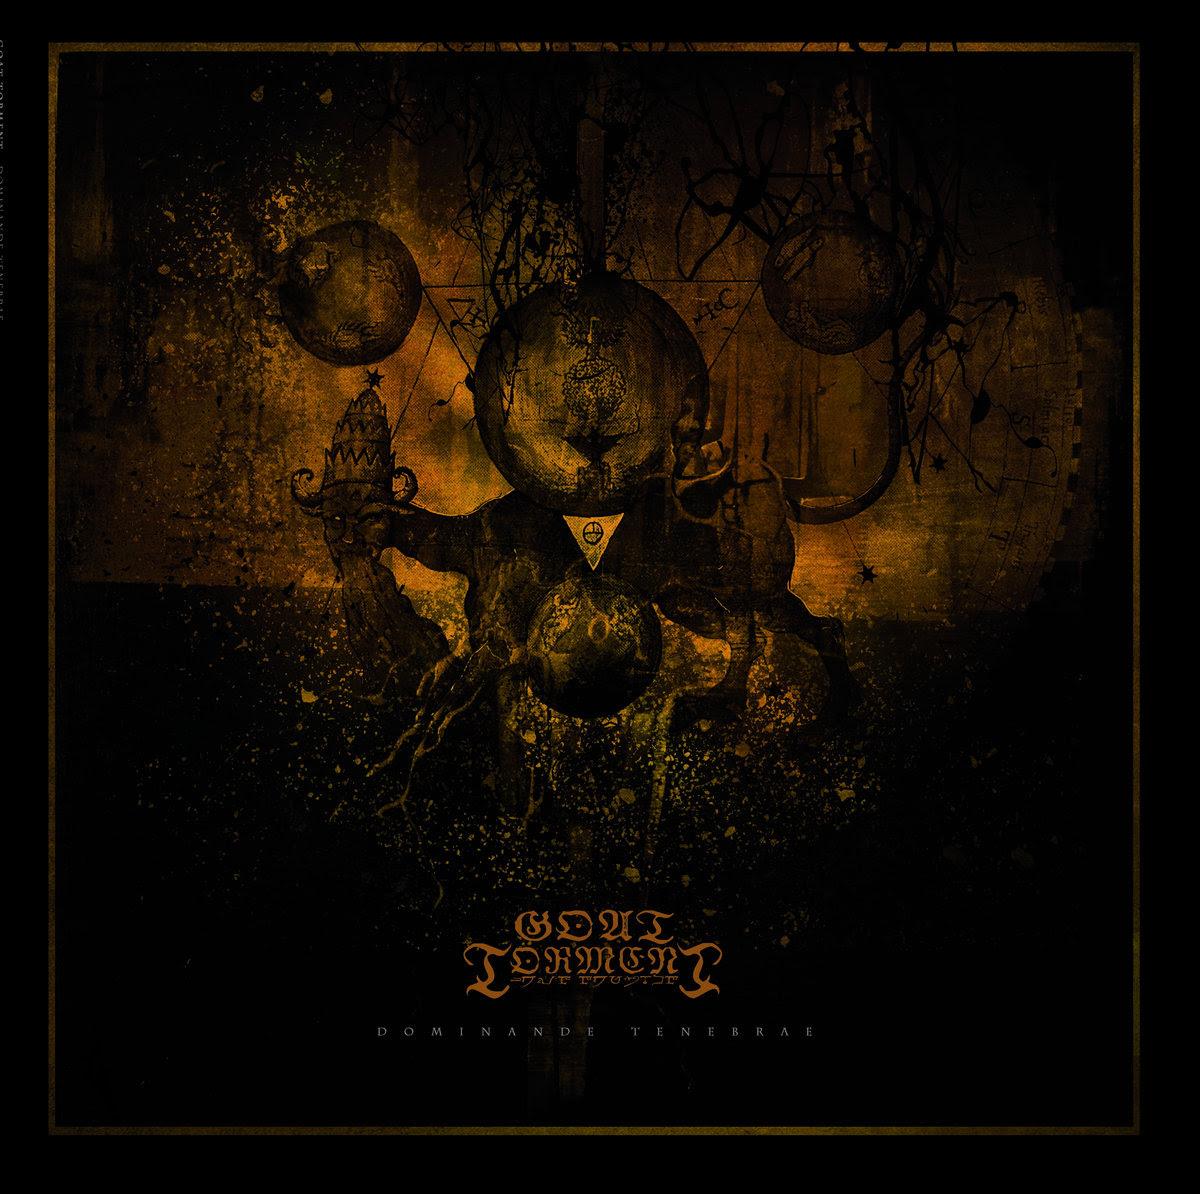 Goat Torment - Dominande Tenebrae (2013)